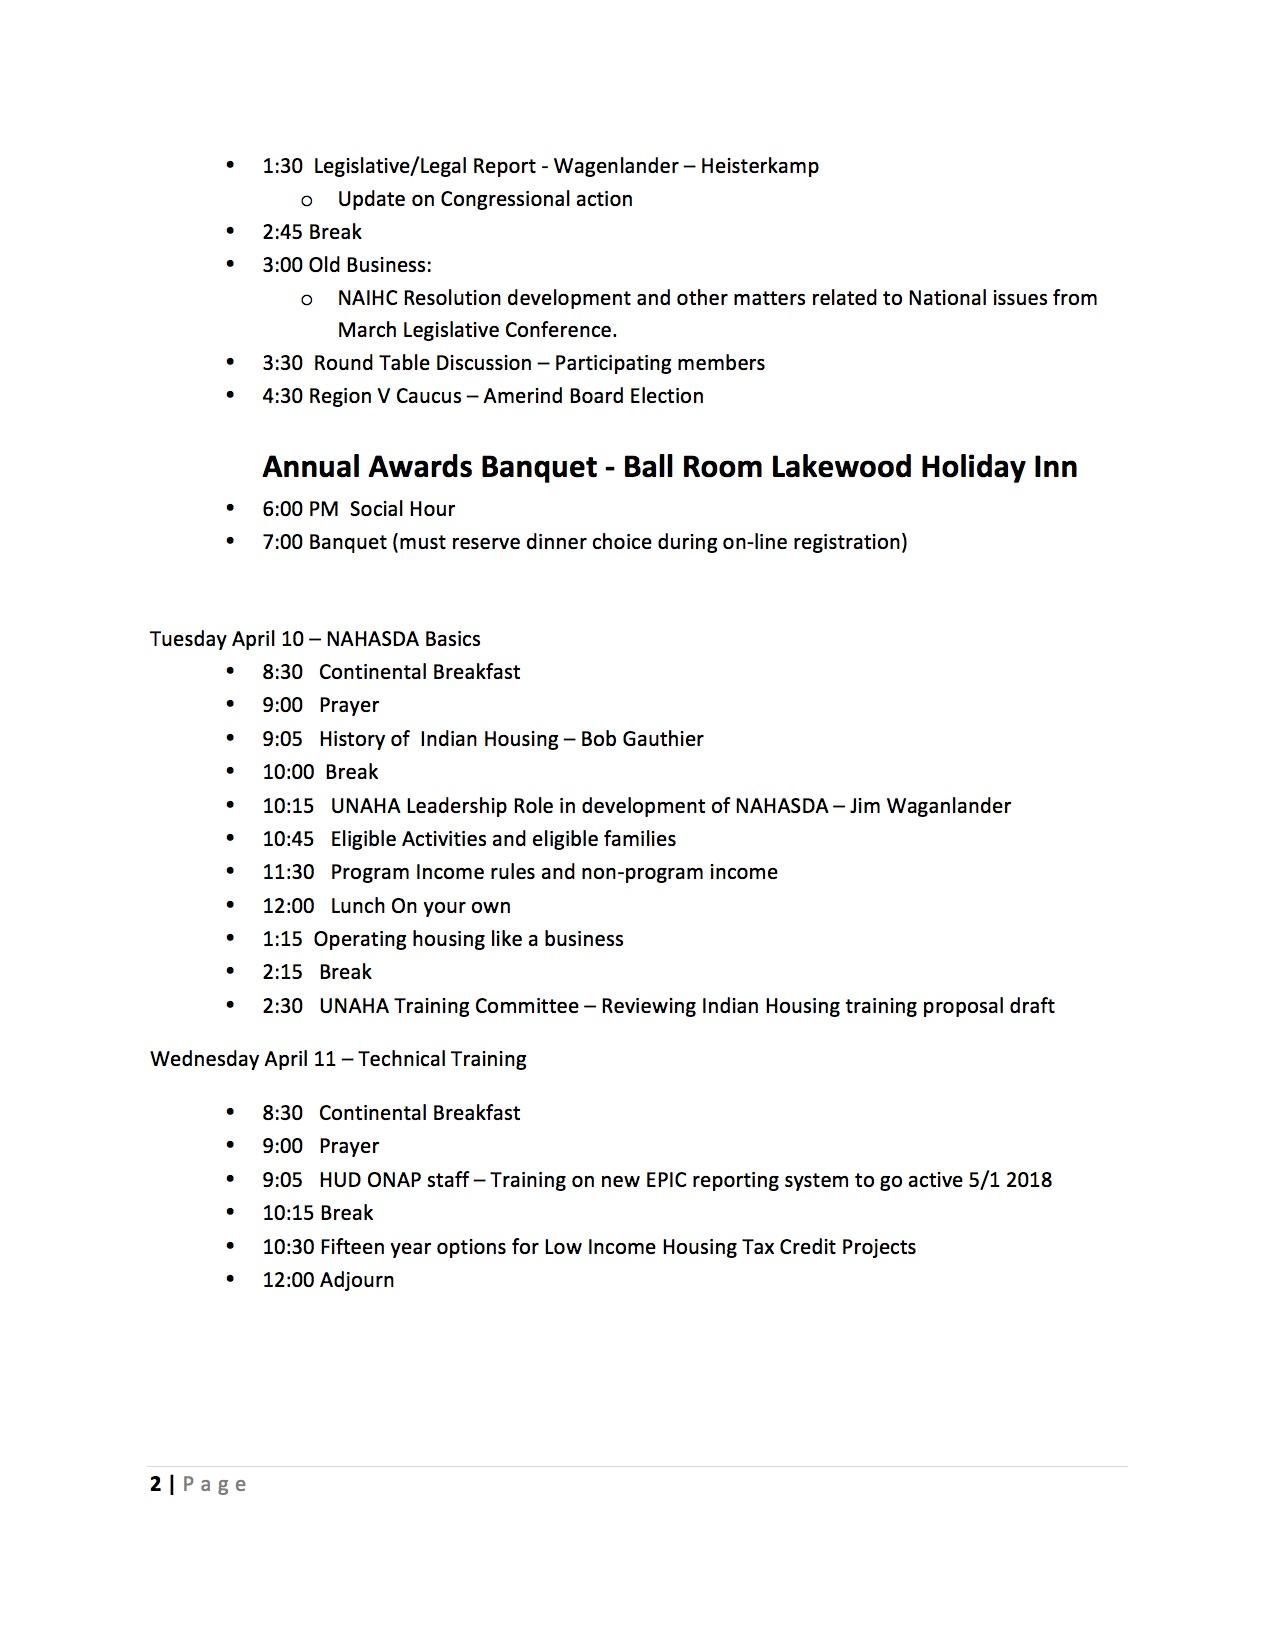 Page 2 Agenda